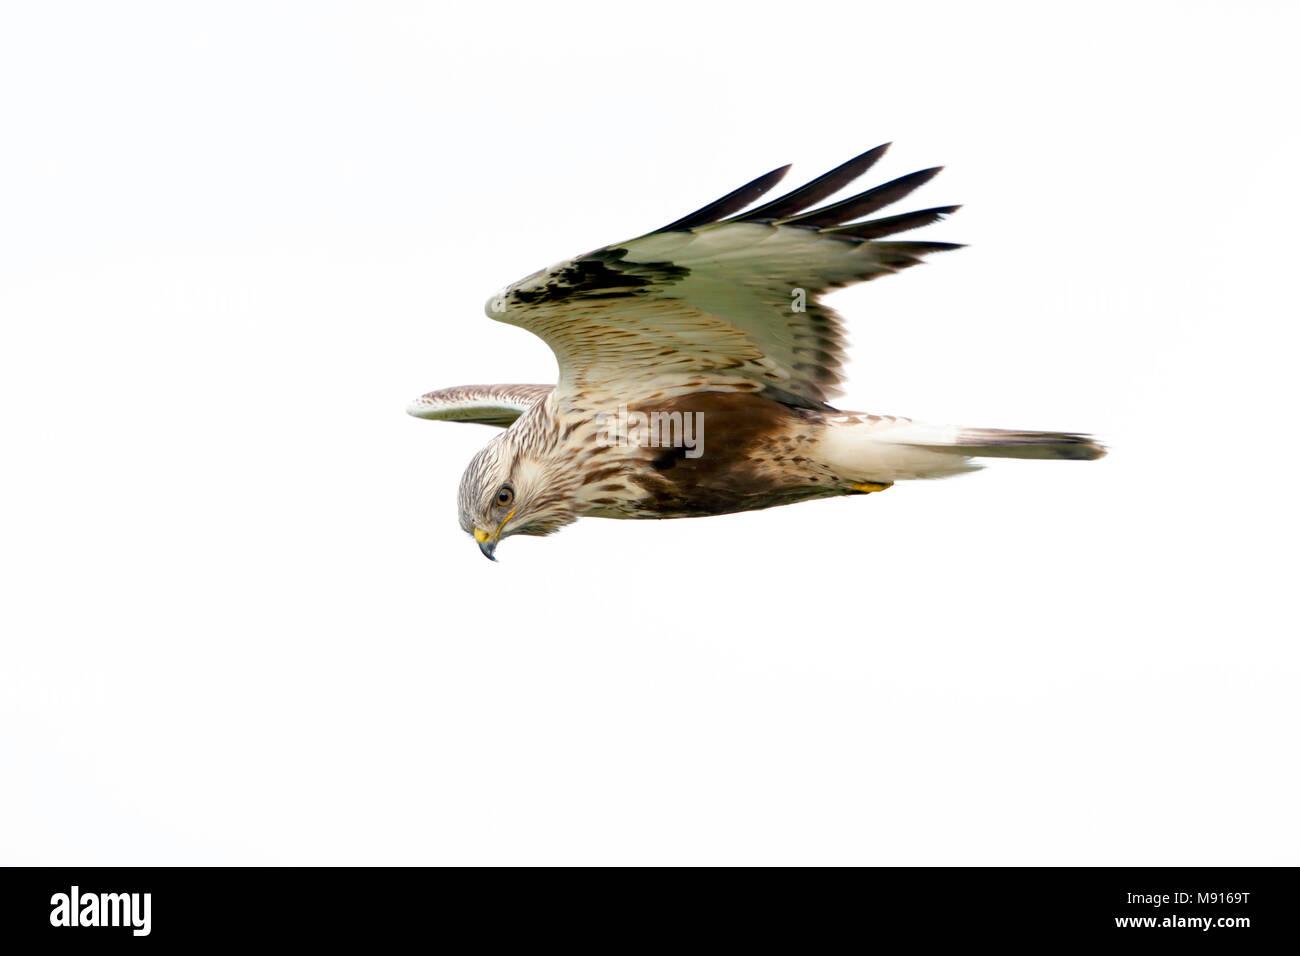 Ruigpootbuizerd vliegend, Rough-legged Buzzard flying, - Stock Image